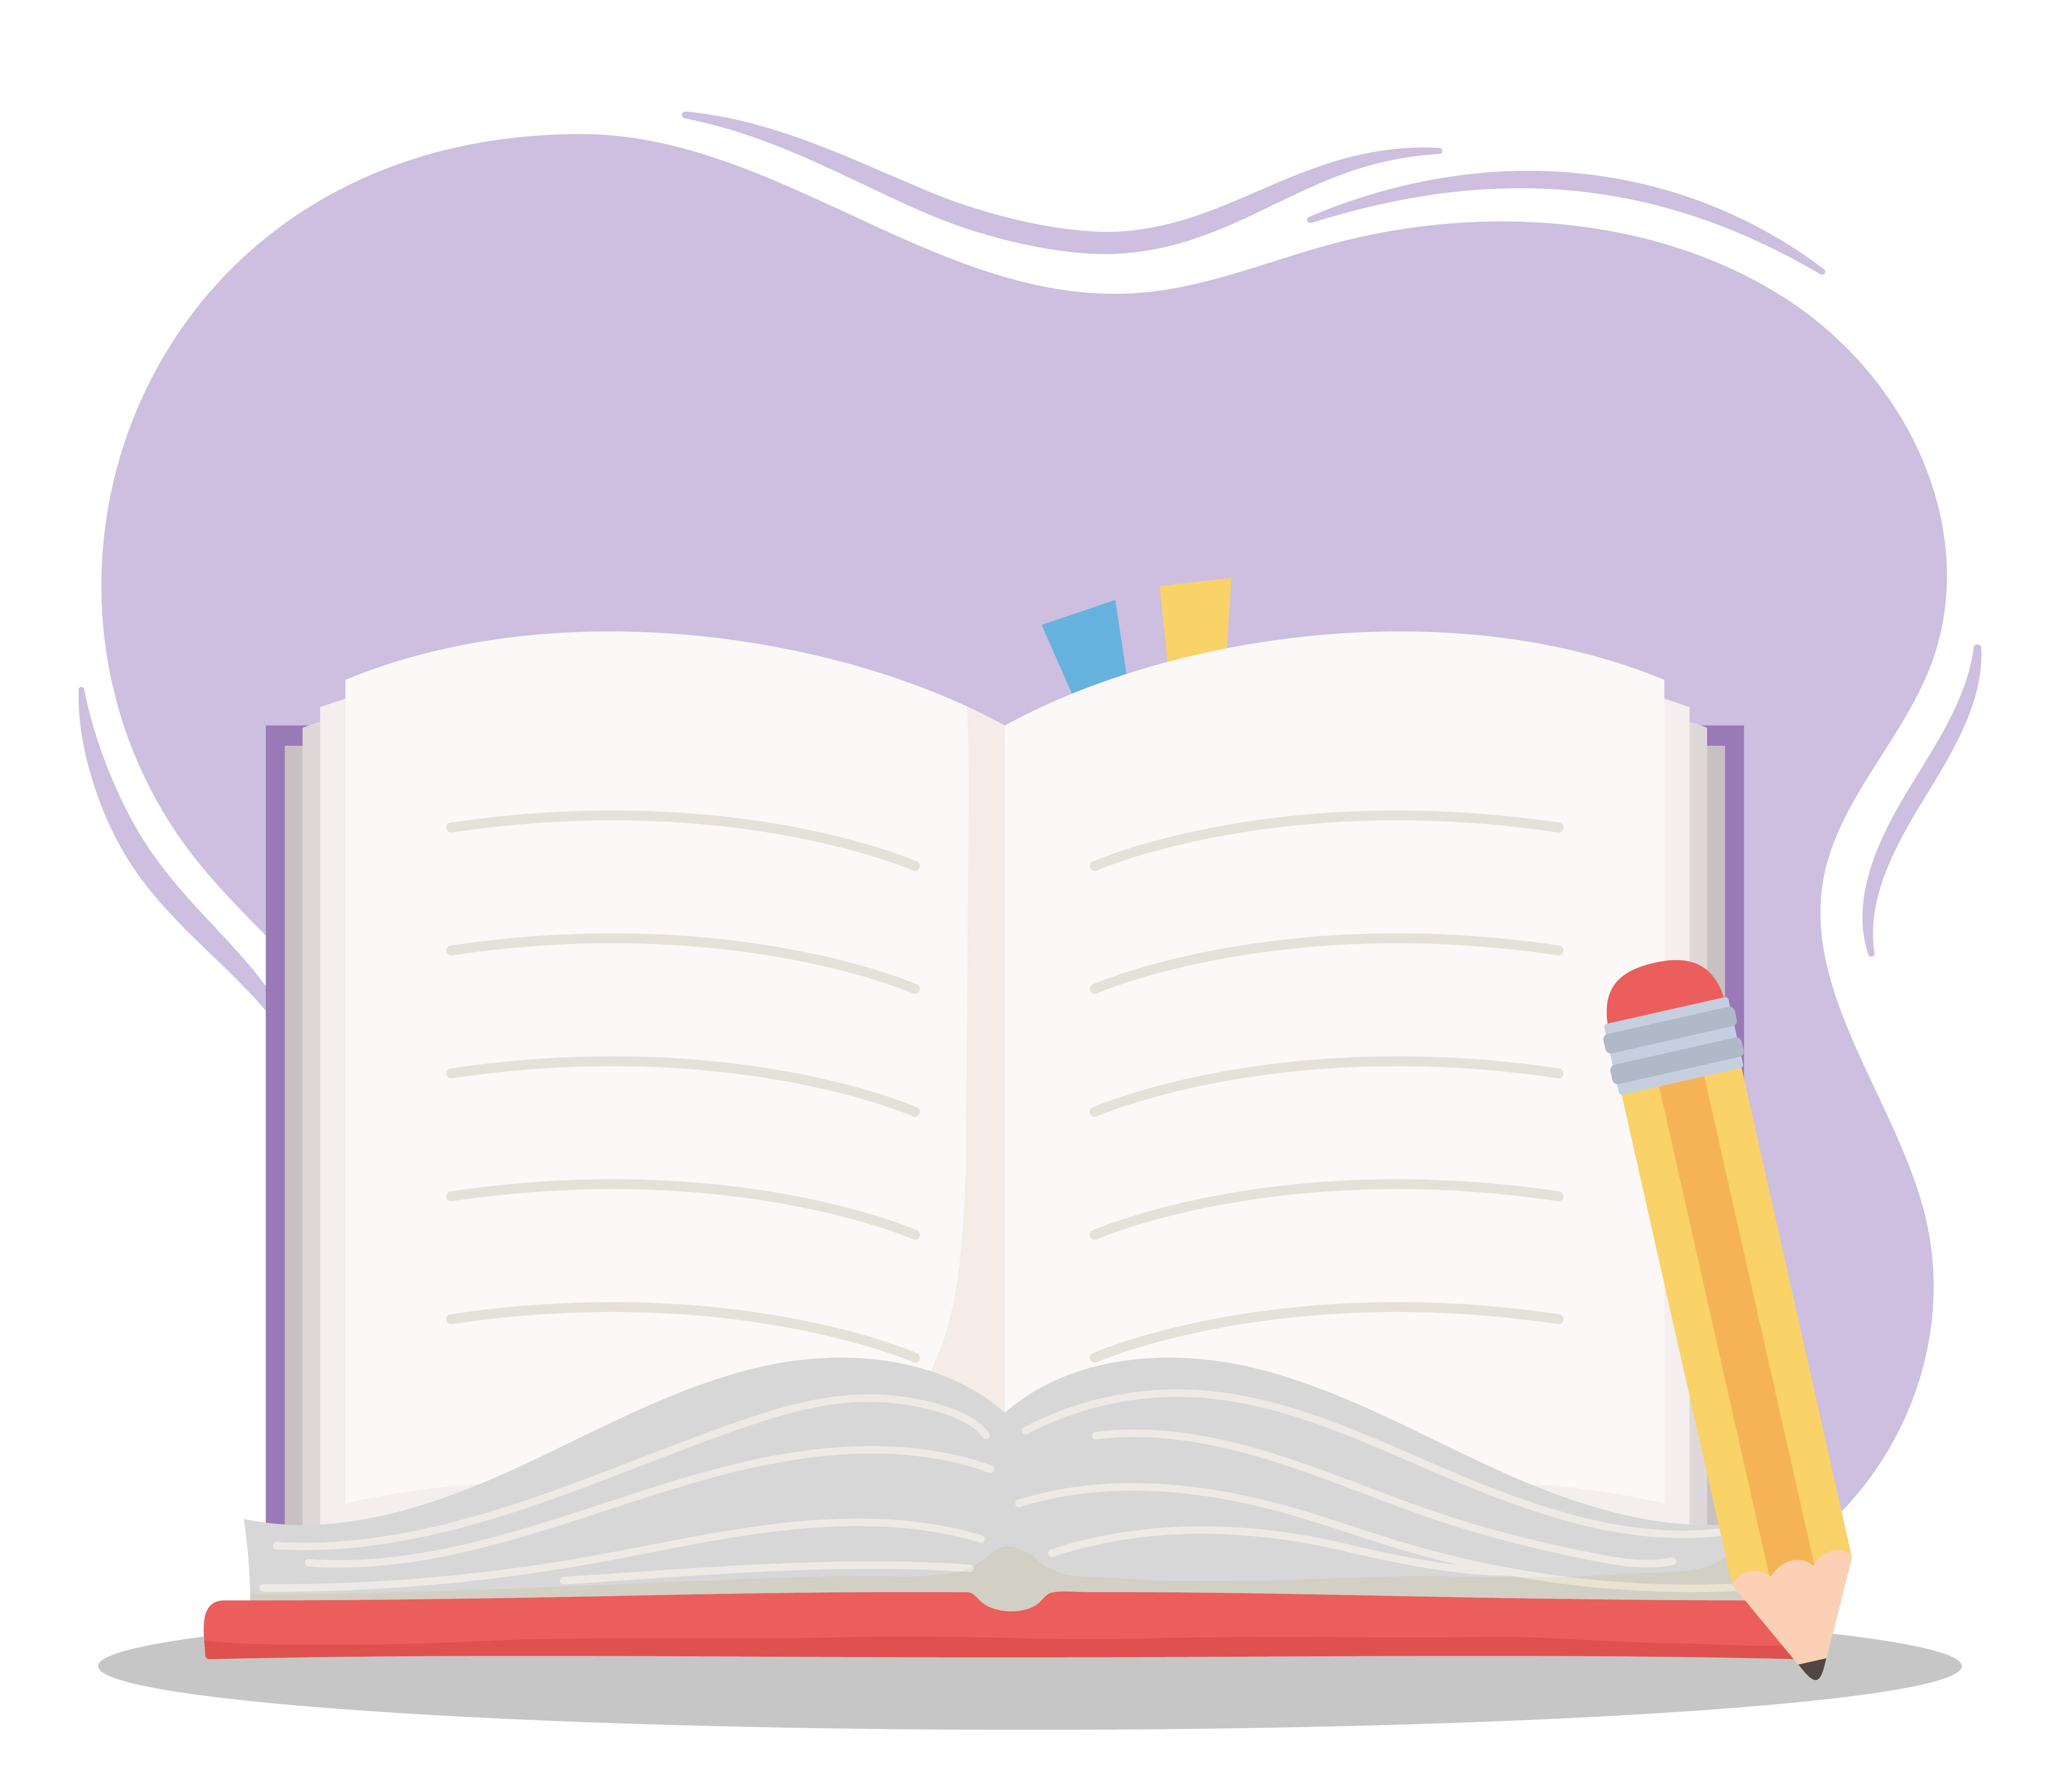 online education open book and pencil school 1830046 vector art at vecteezy